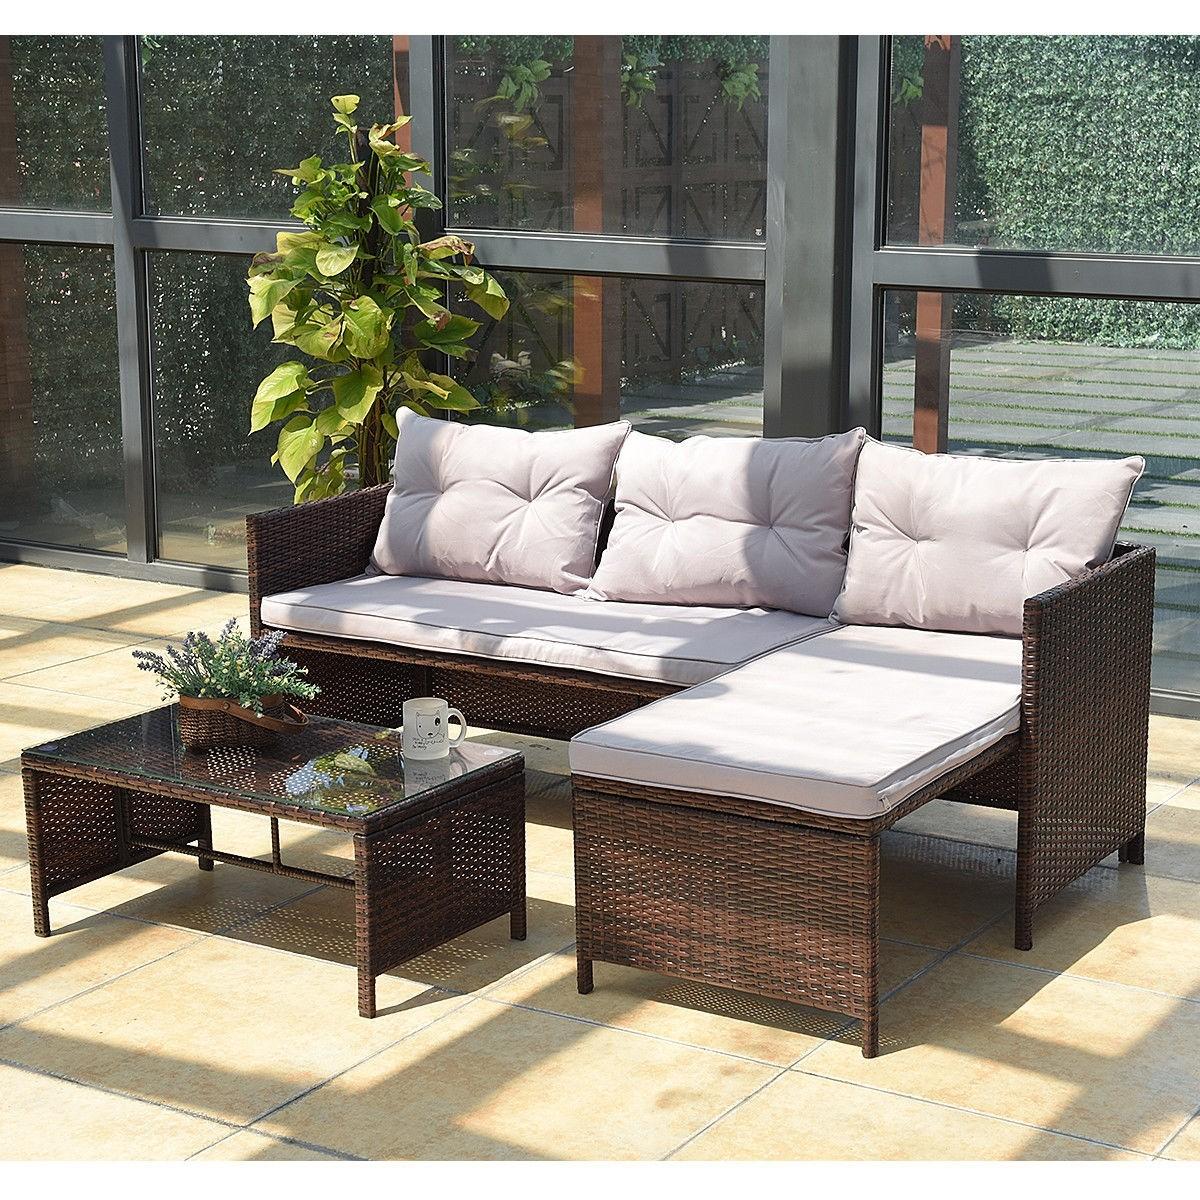 Large Outdoor Sofa Set Clearance Deck Garden Patio Rattan ... on Patio Loveseat Set id=74330